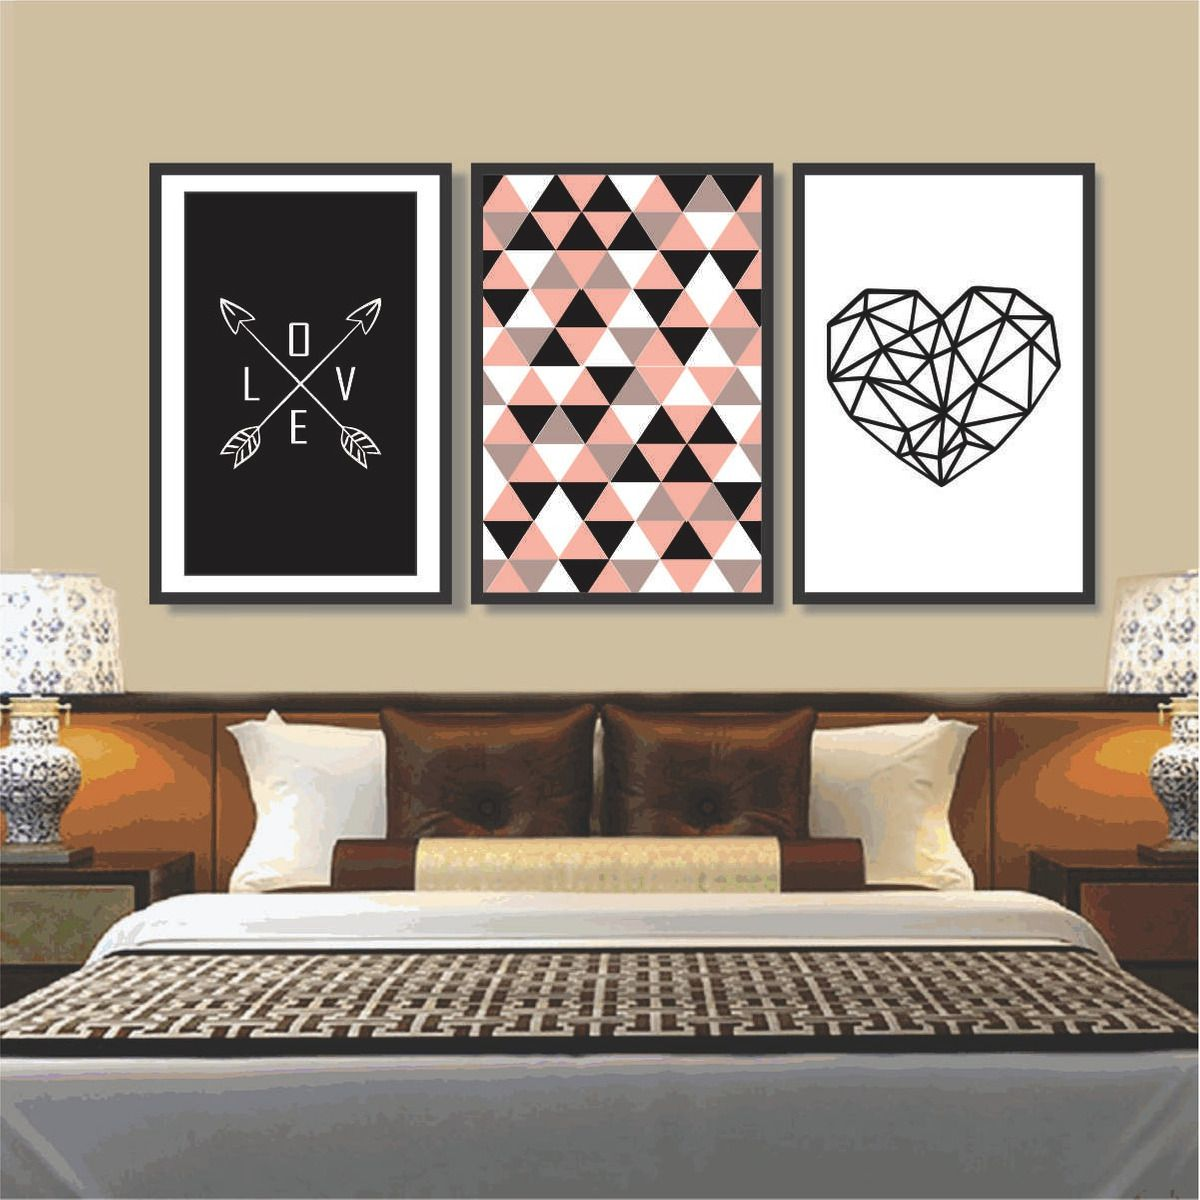 Quadro Decorativo Mosaico Amor Love Moldura Preta 60x120 cm